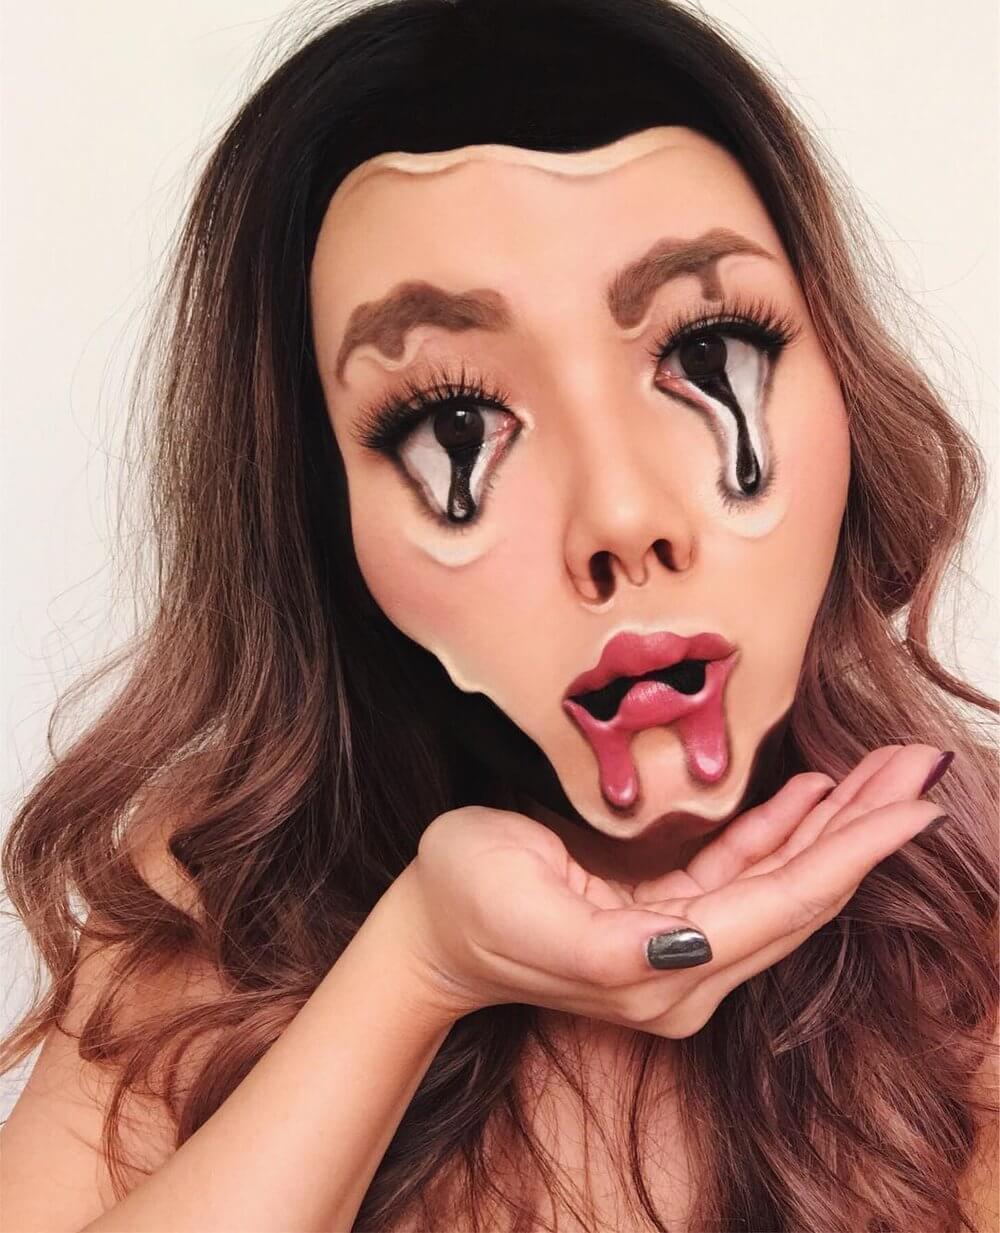 mimi choi makeup portraits 16 (1)